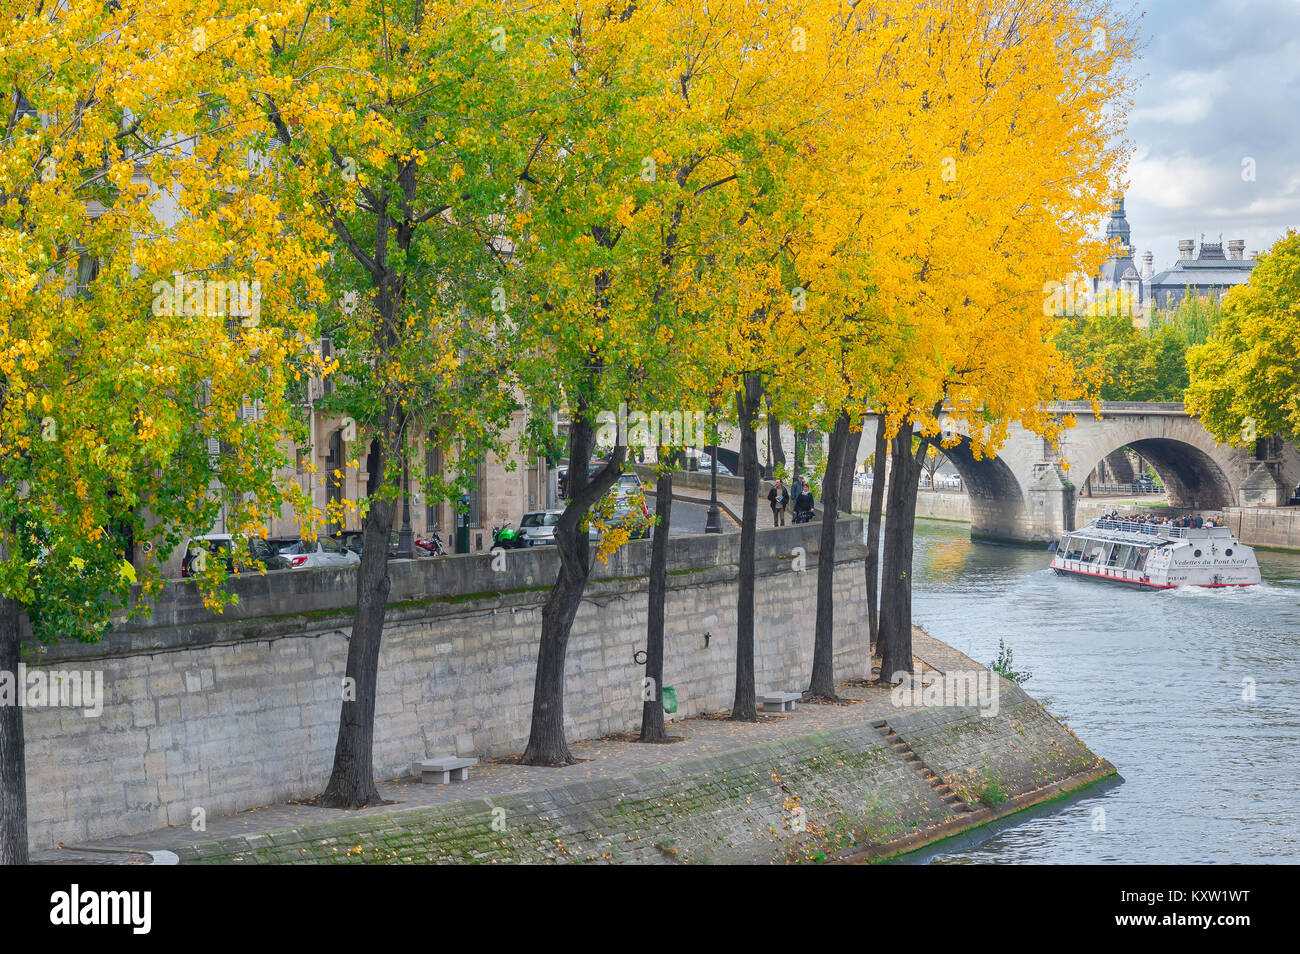 Autumn Paris, trees with colourful autumn foliage line an embankment along the Quai d'Orleans on the Ile St - Stock Image